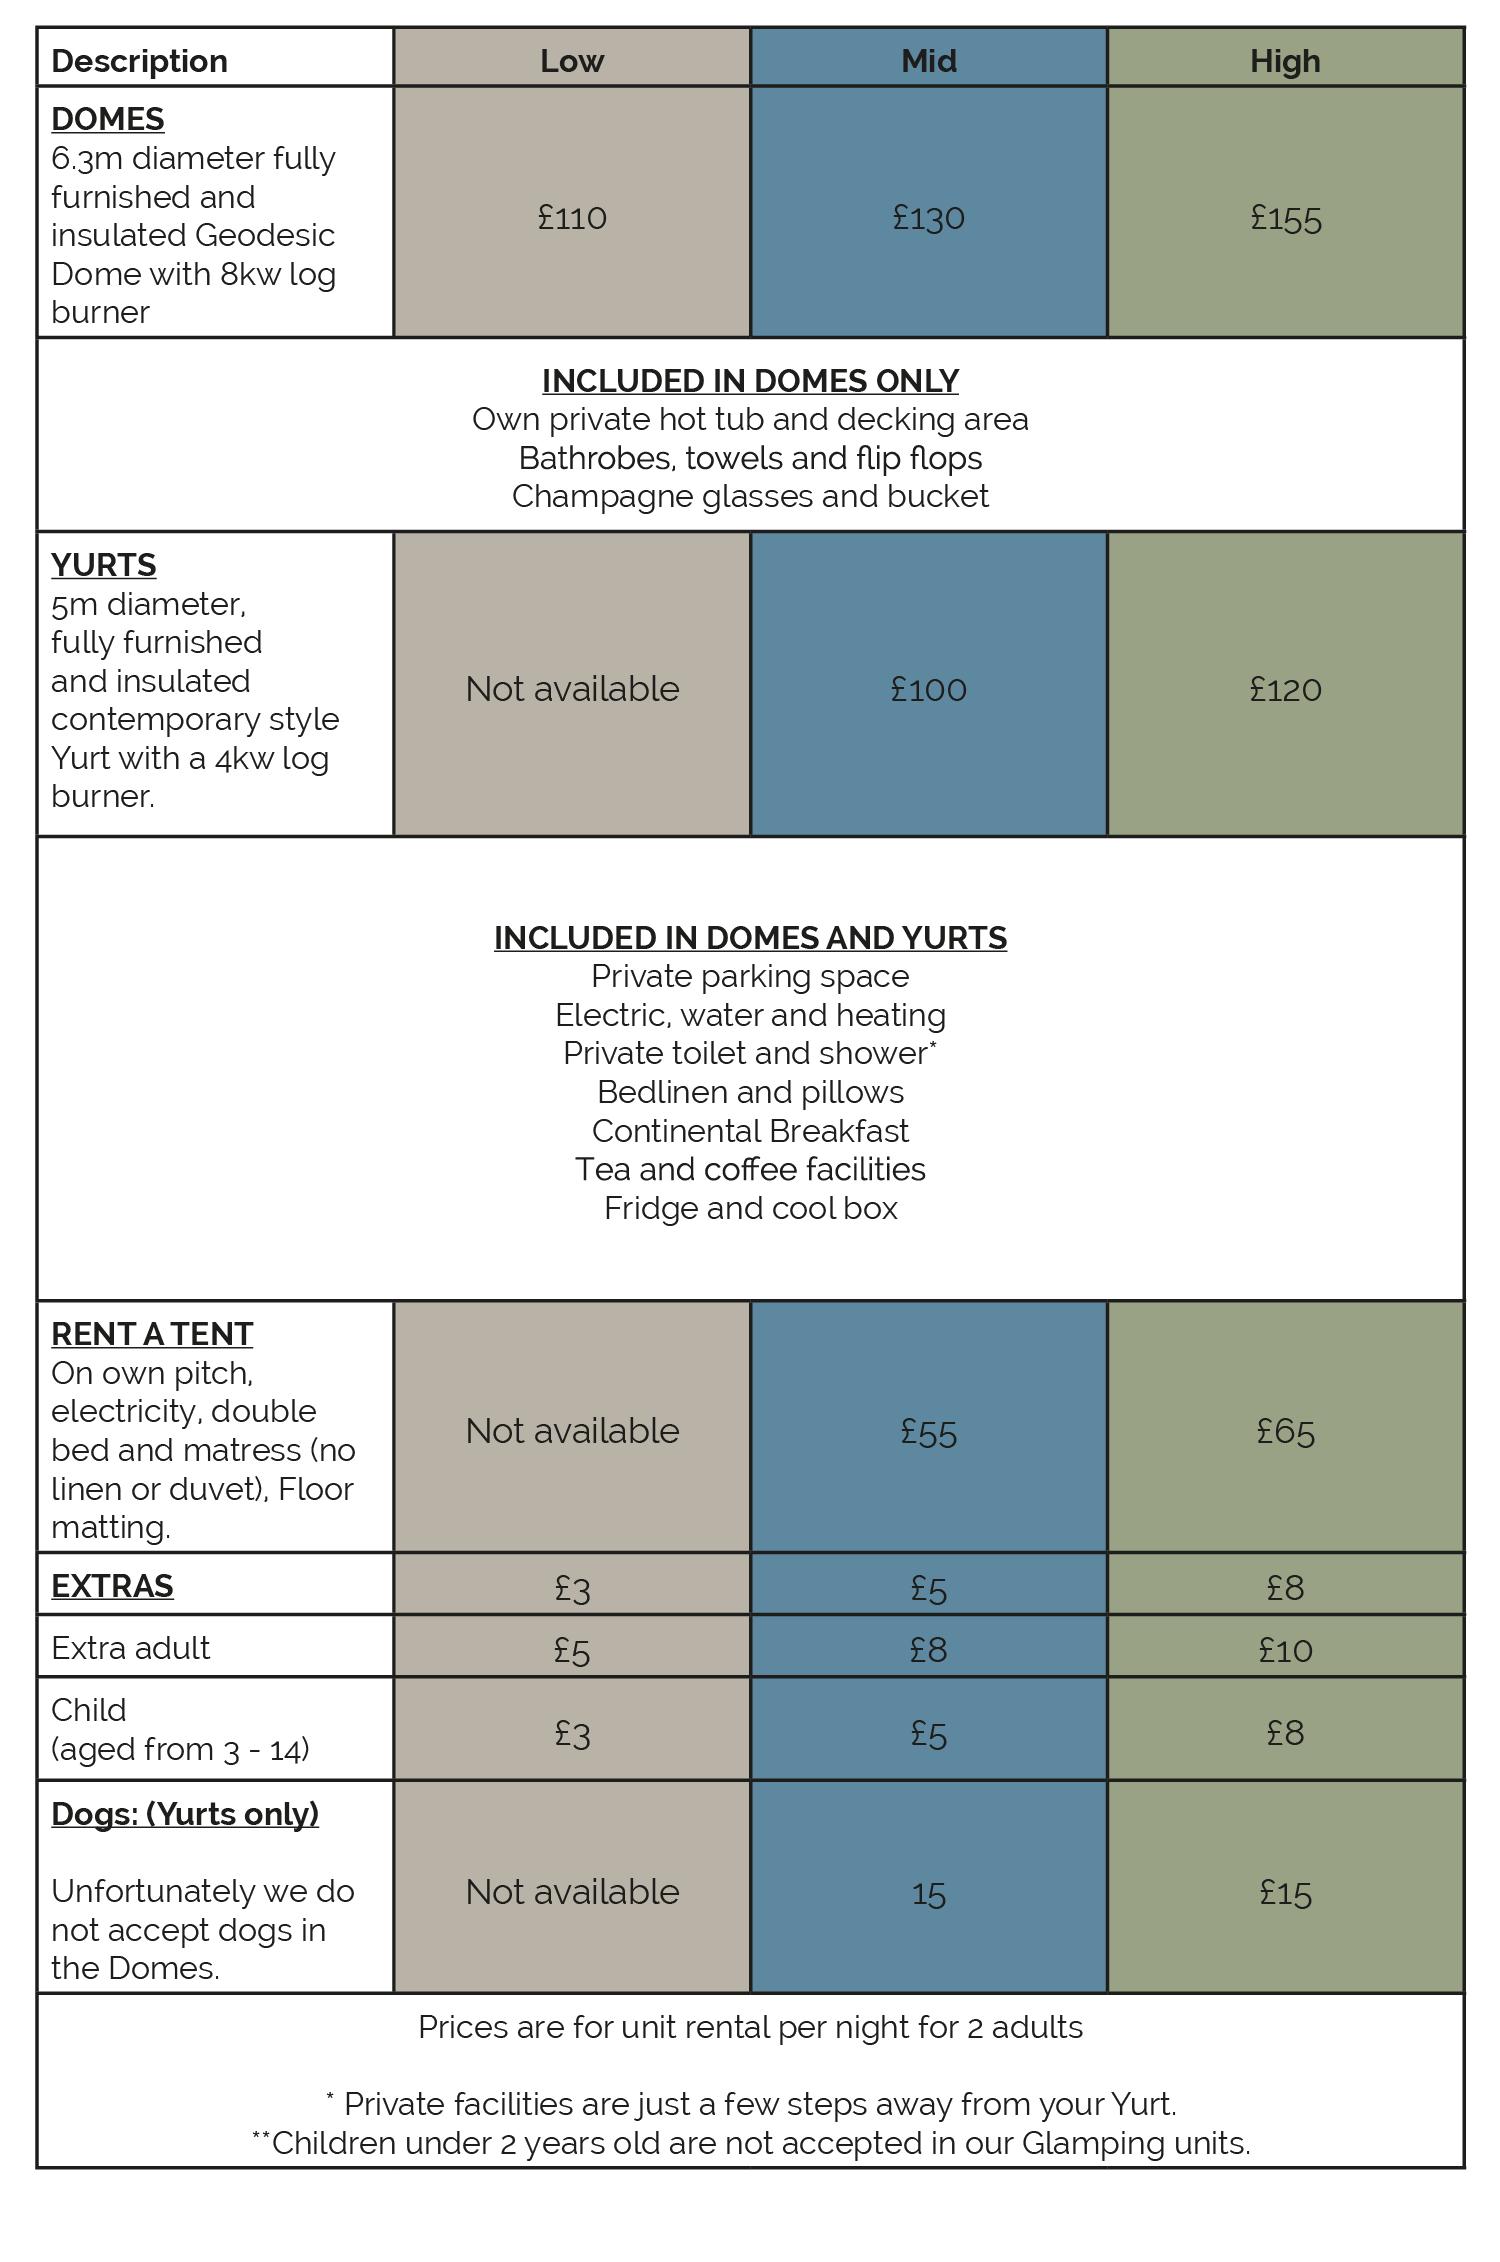 Glampsite-Prices